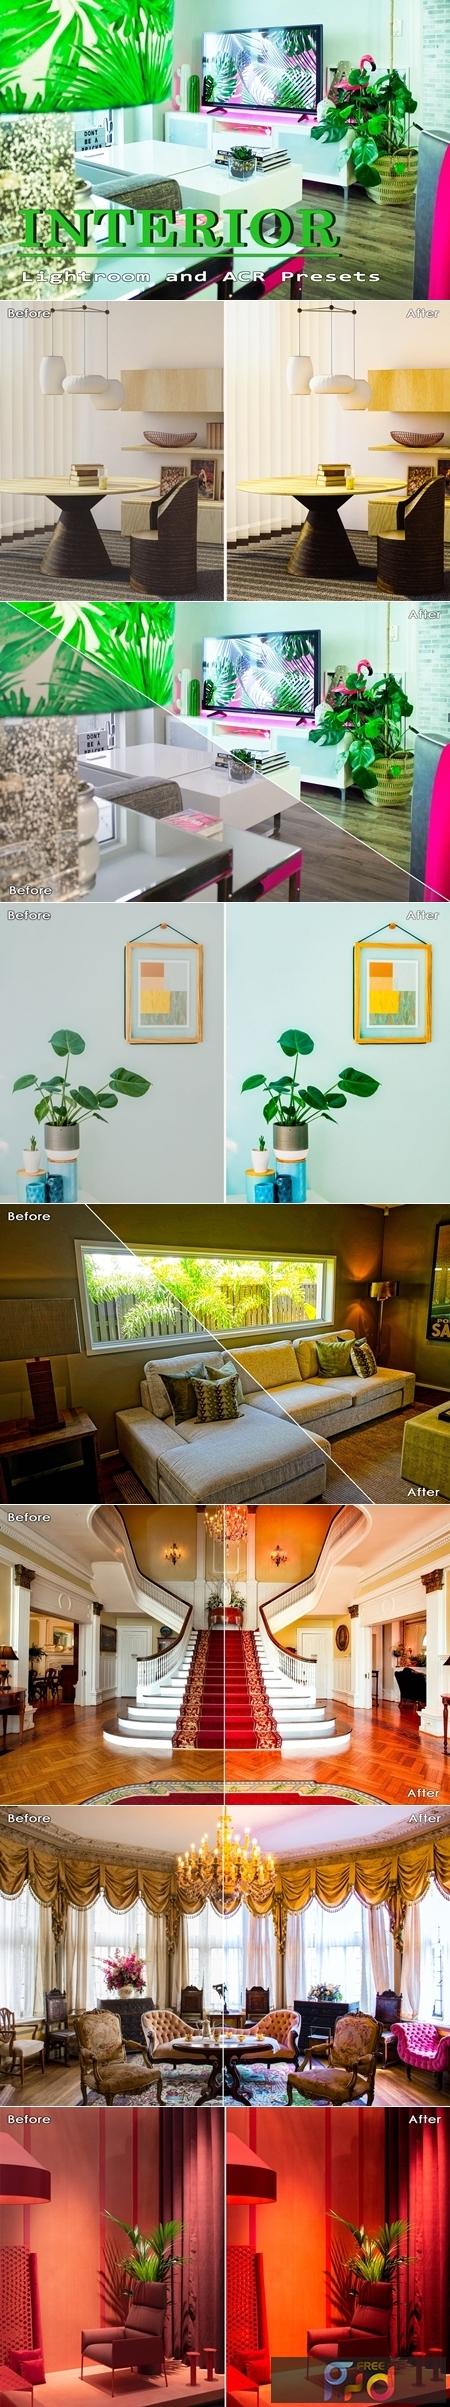 Interior Lightroom and ACR Presets 3602911 1